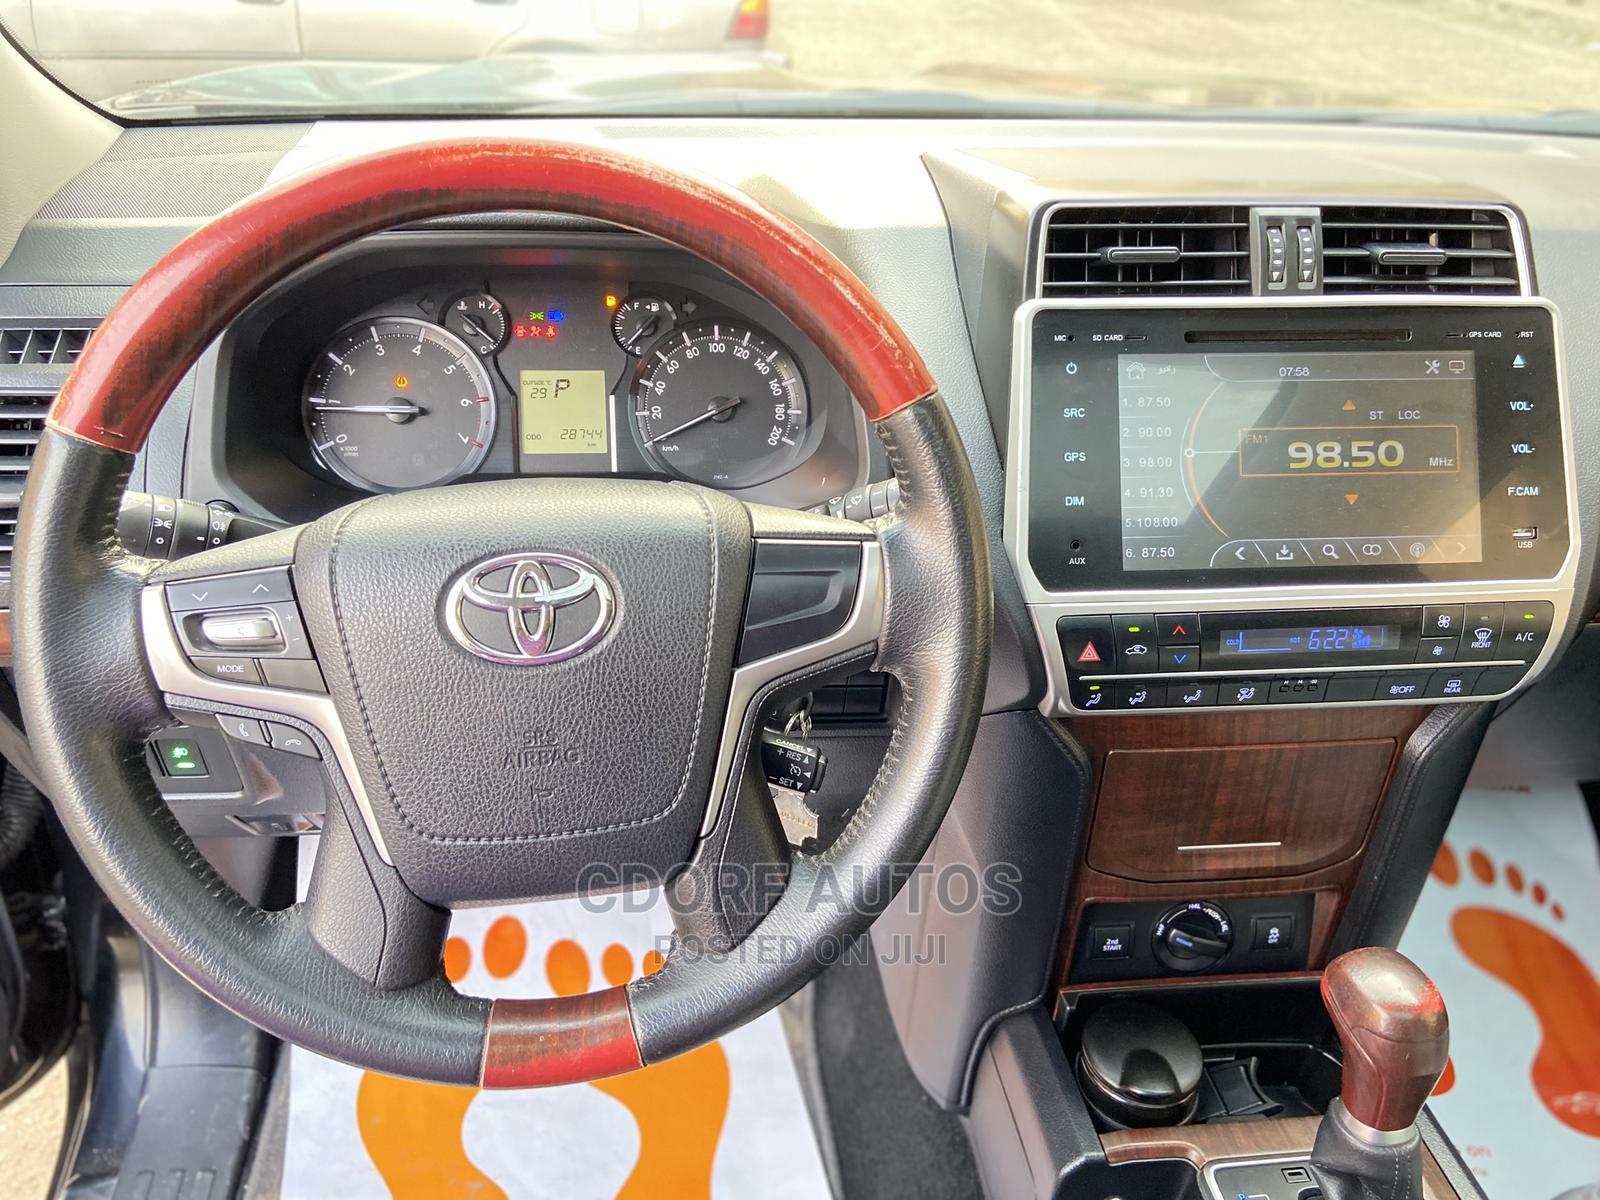 Archive: Toyota Land Cruiser Prado 2018 4.0 Black